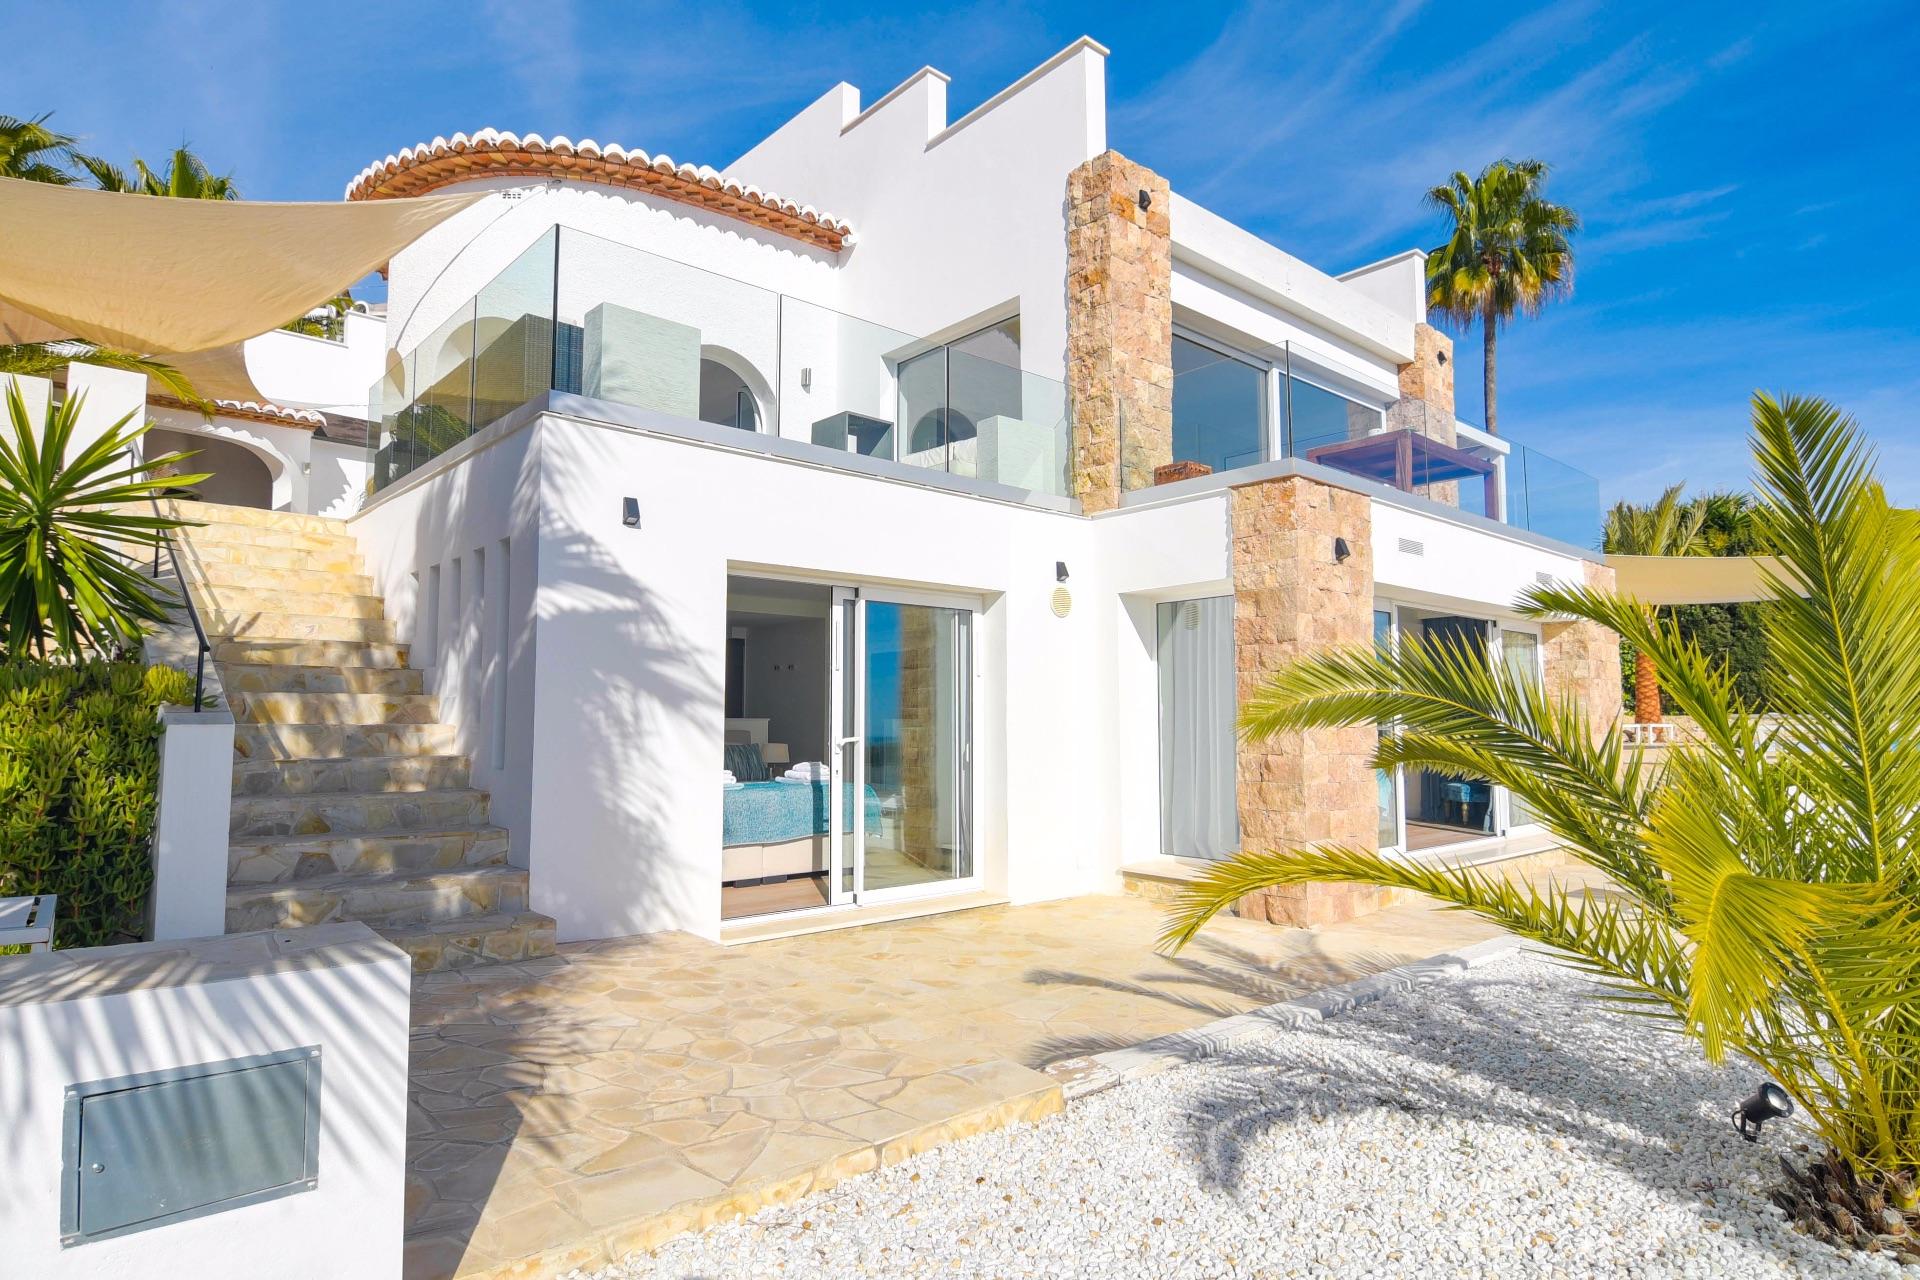 Villa in Moraira, holiday rentals